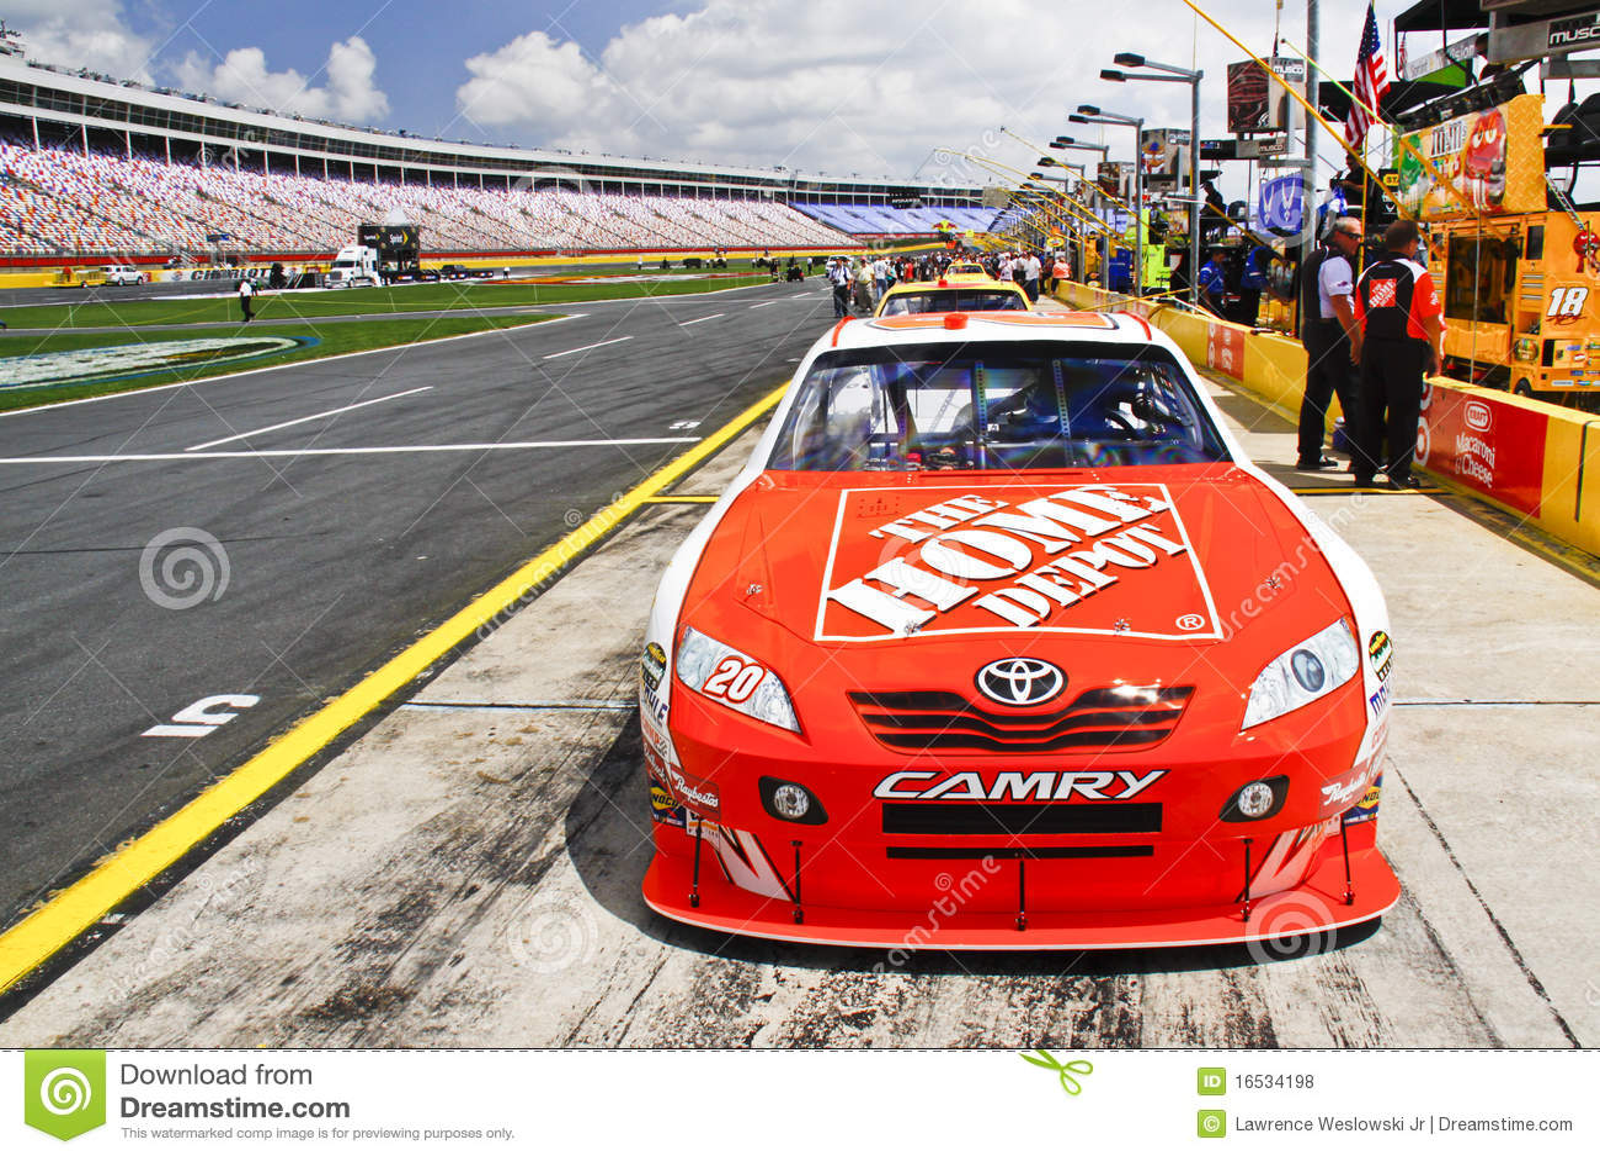 NASCAR - Home Depot Sponsorship